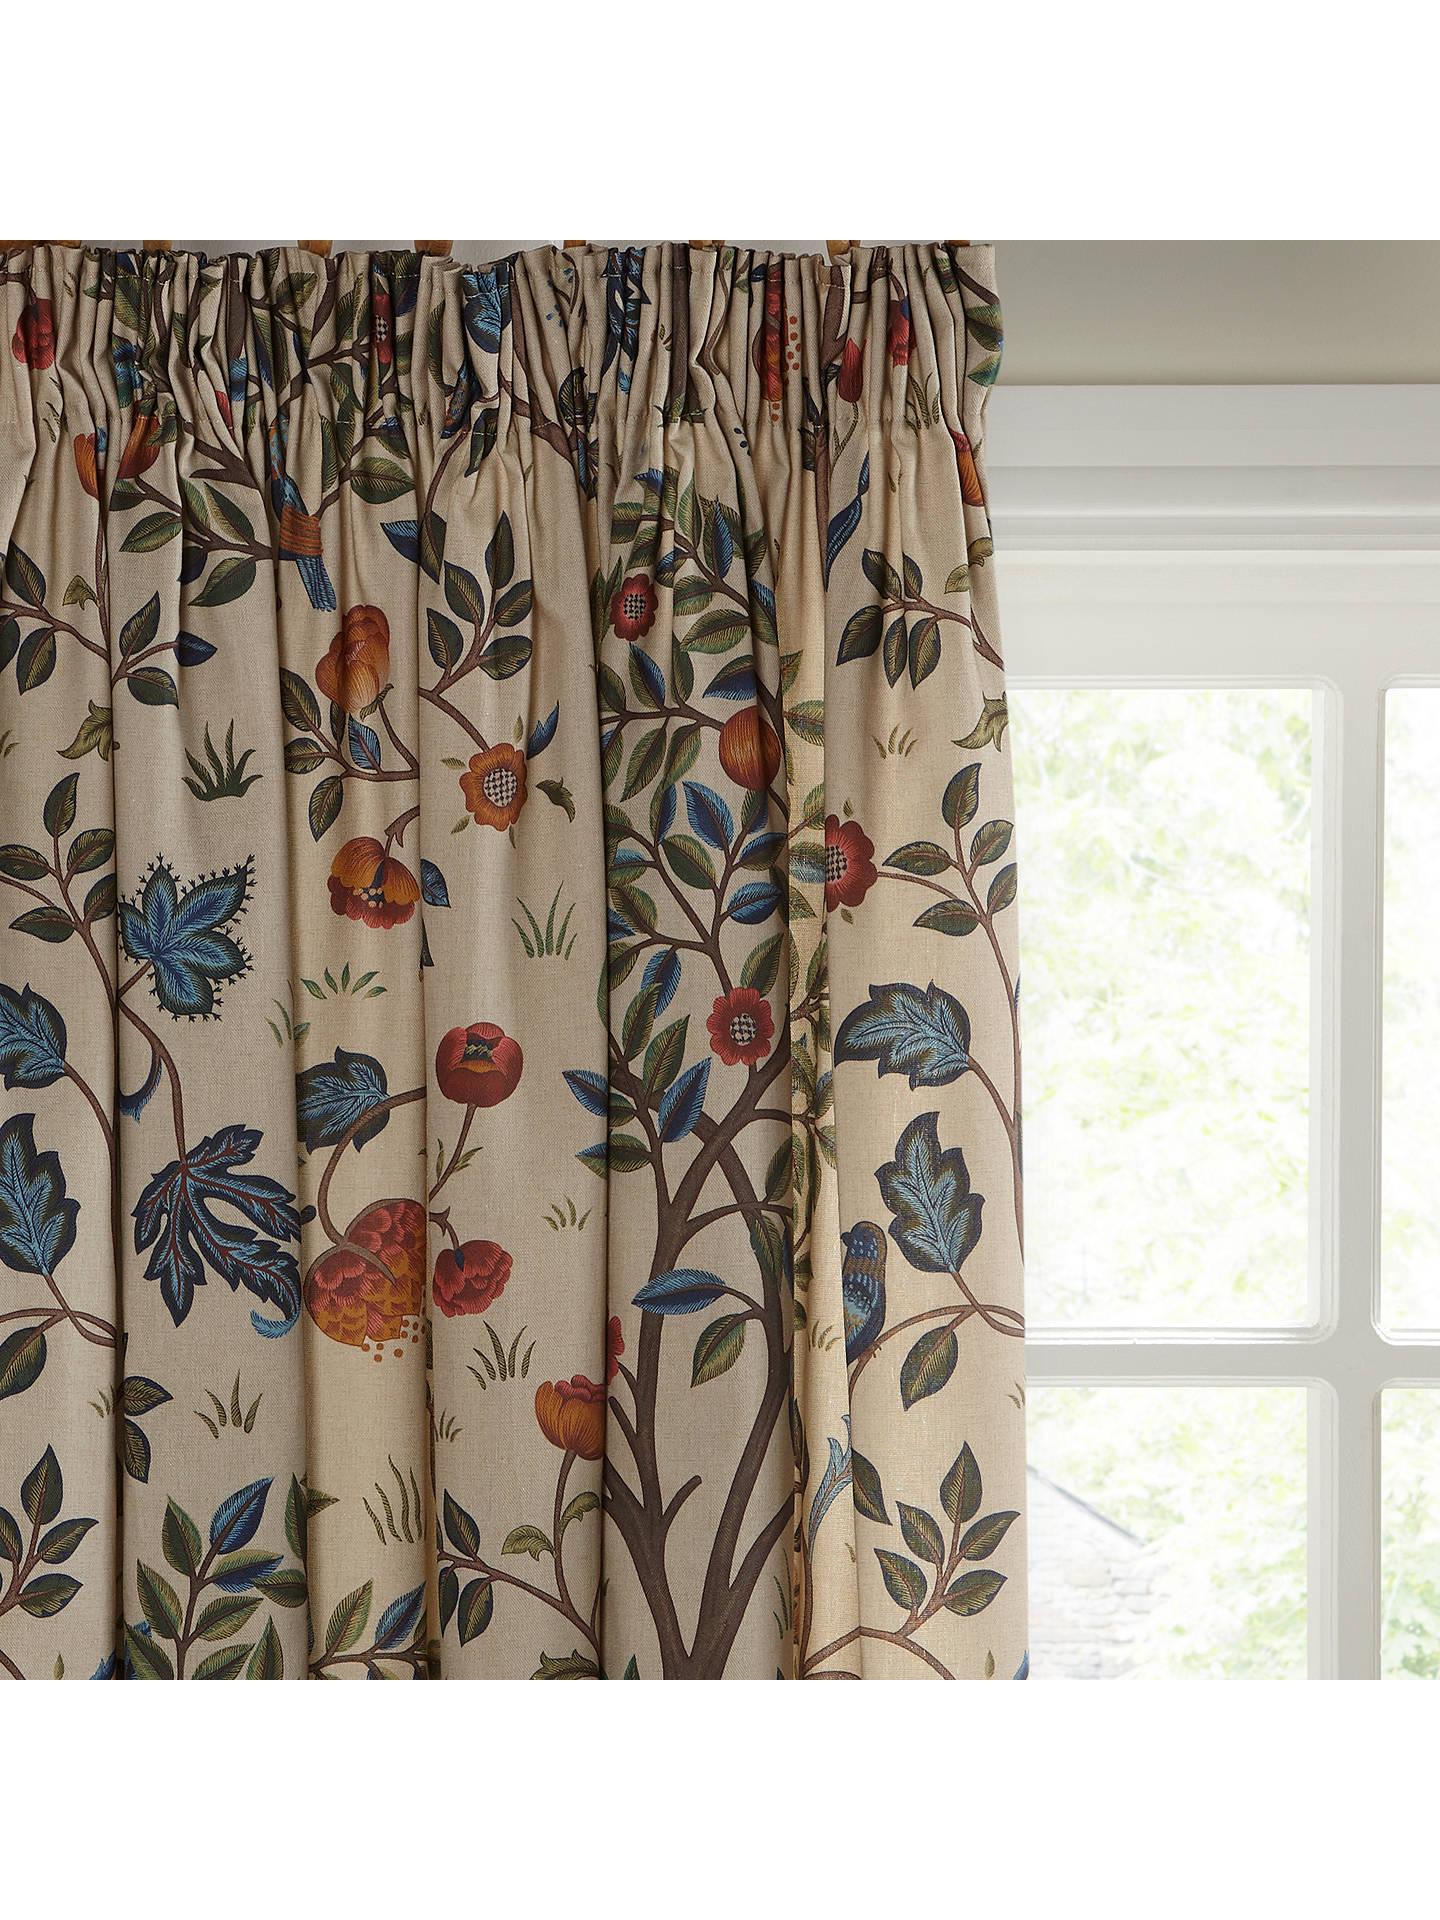 Buy Morris Co Kelmscott Tree Pair Lined Pencil Pleat Curtains Multi W167